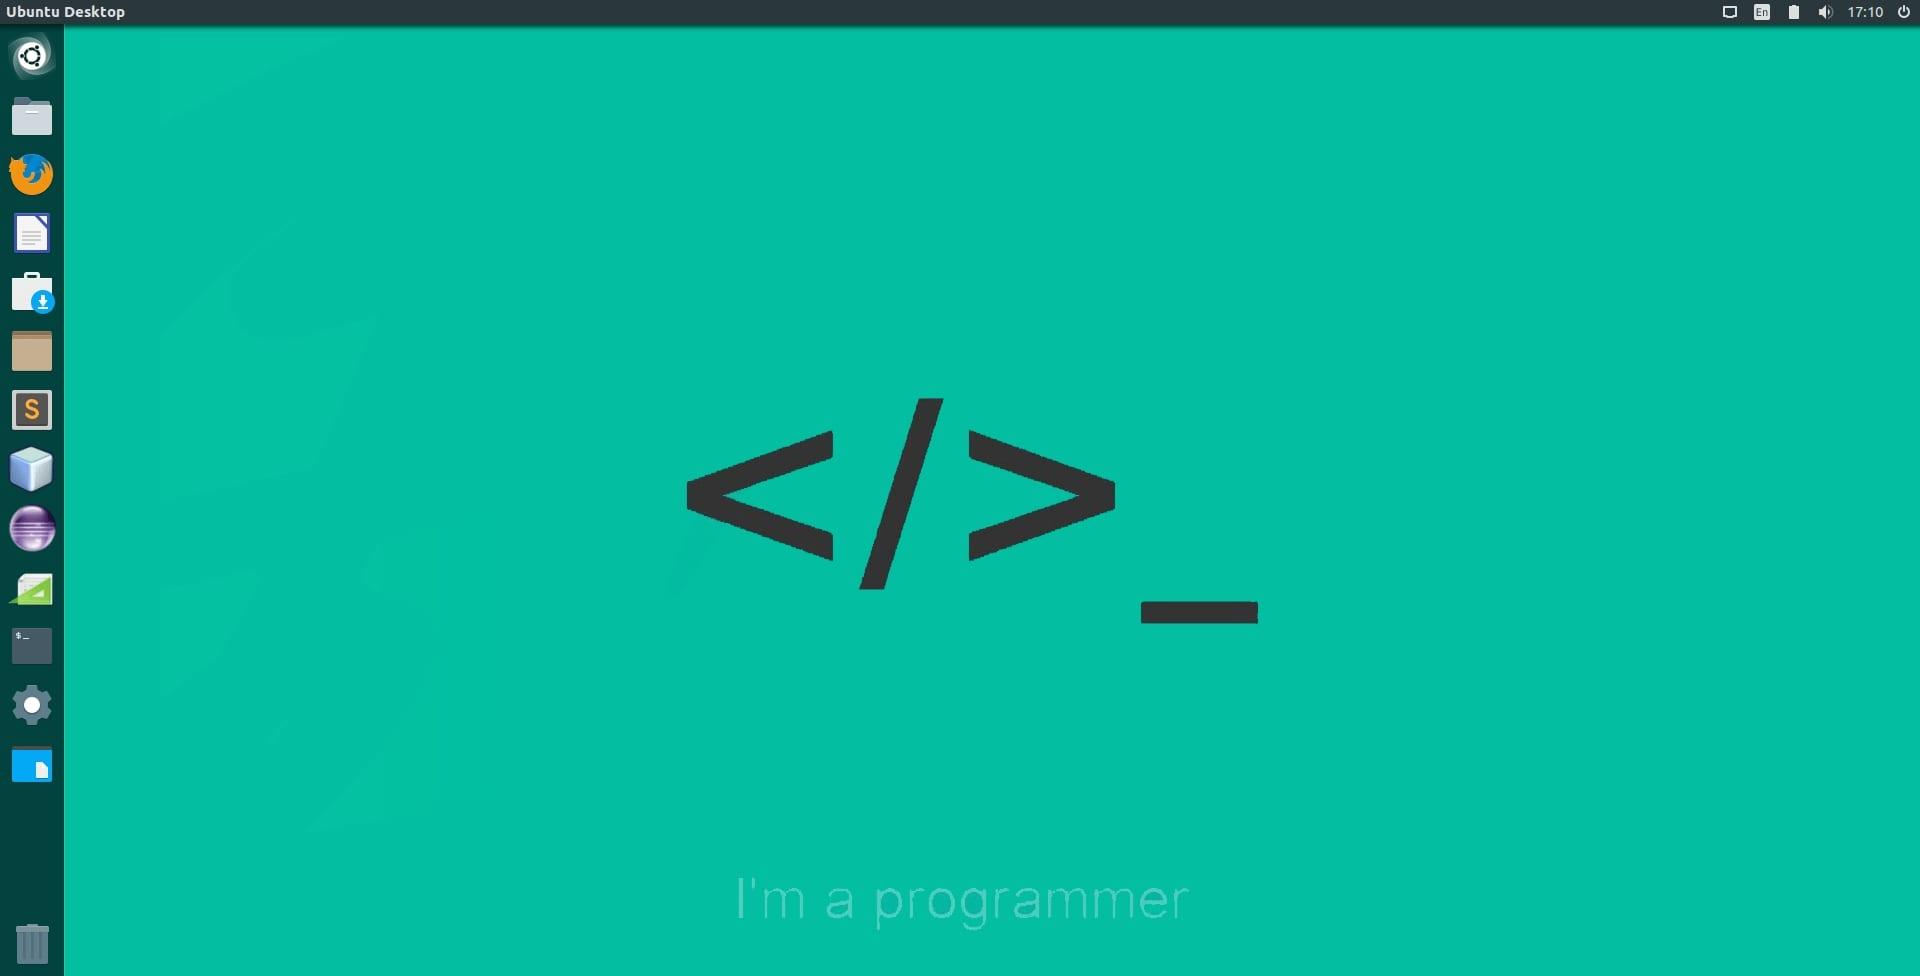 Programmer OS